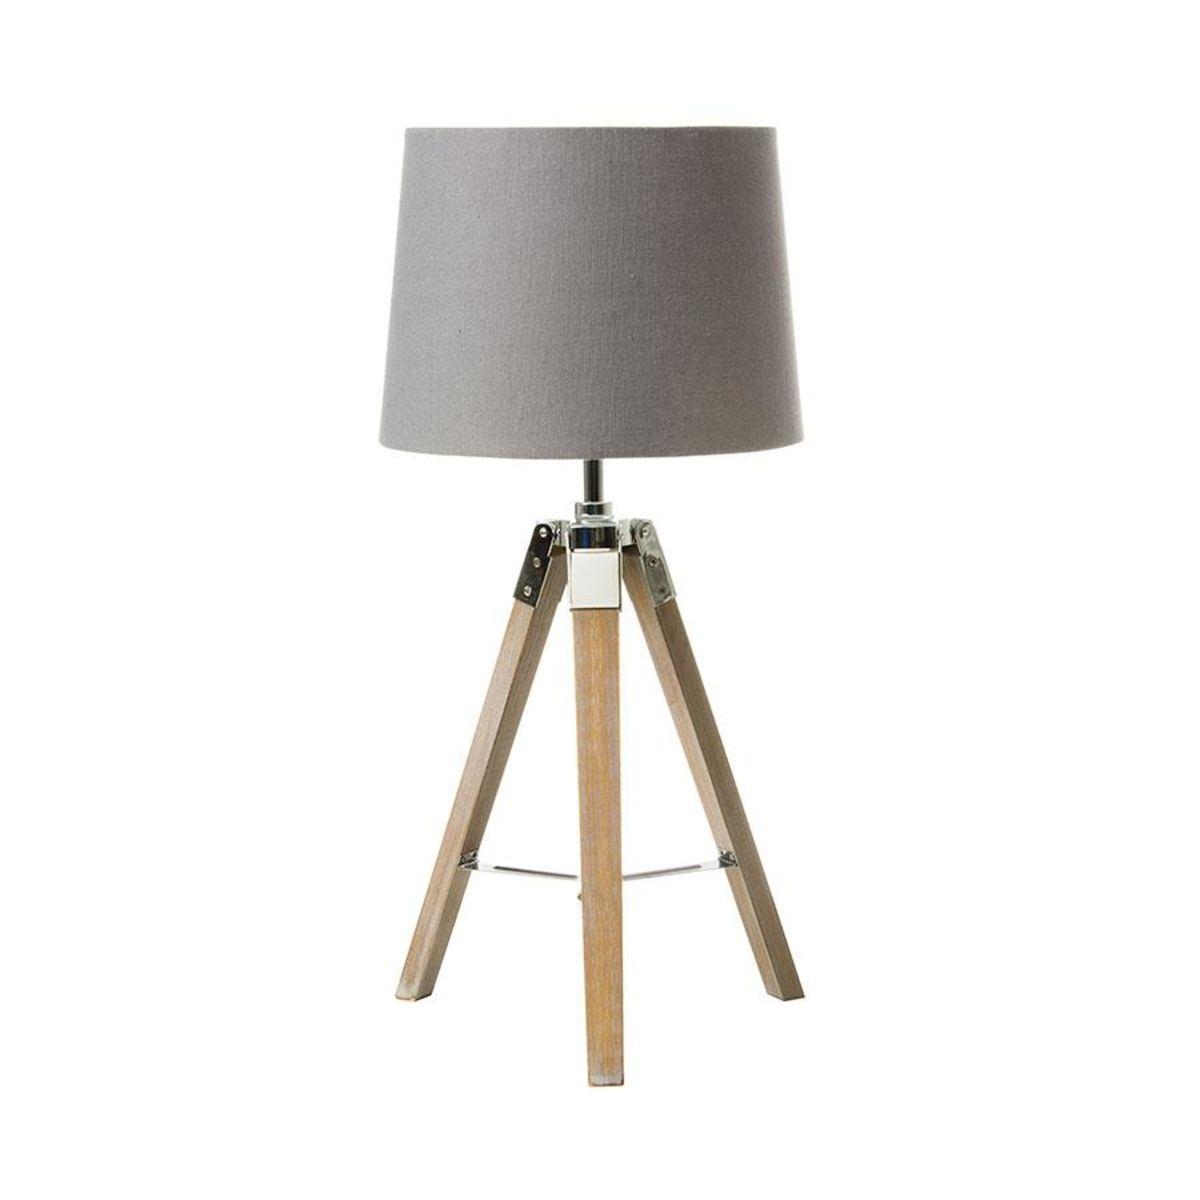 Tripod Table Lamp Homemaker 20 Lamp Tripod Table Lamp Tripod Lamp